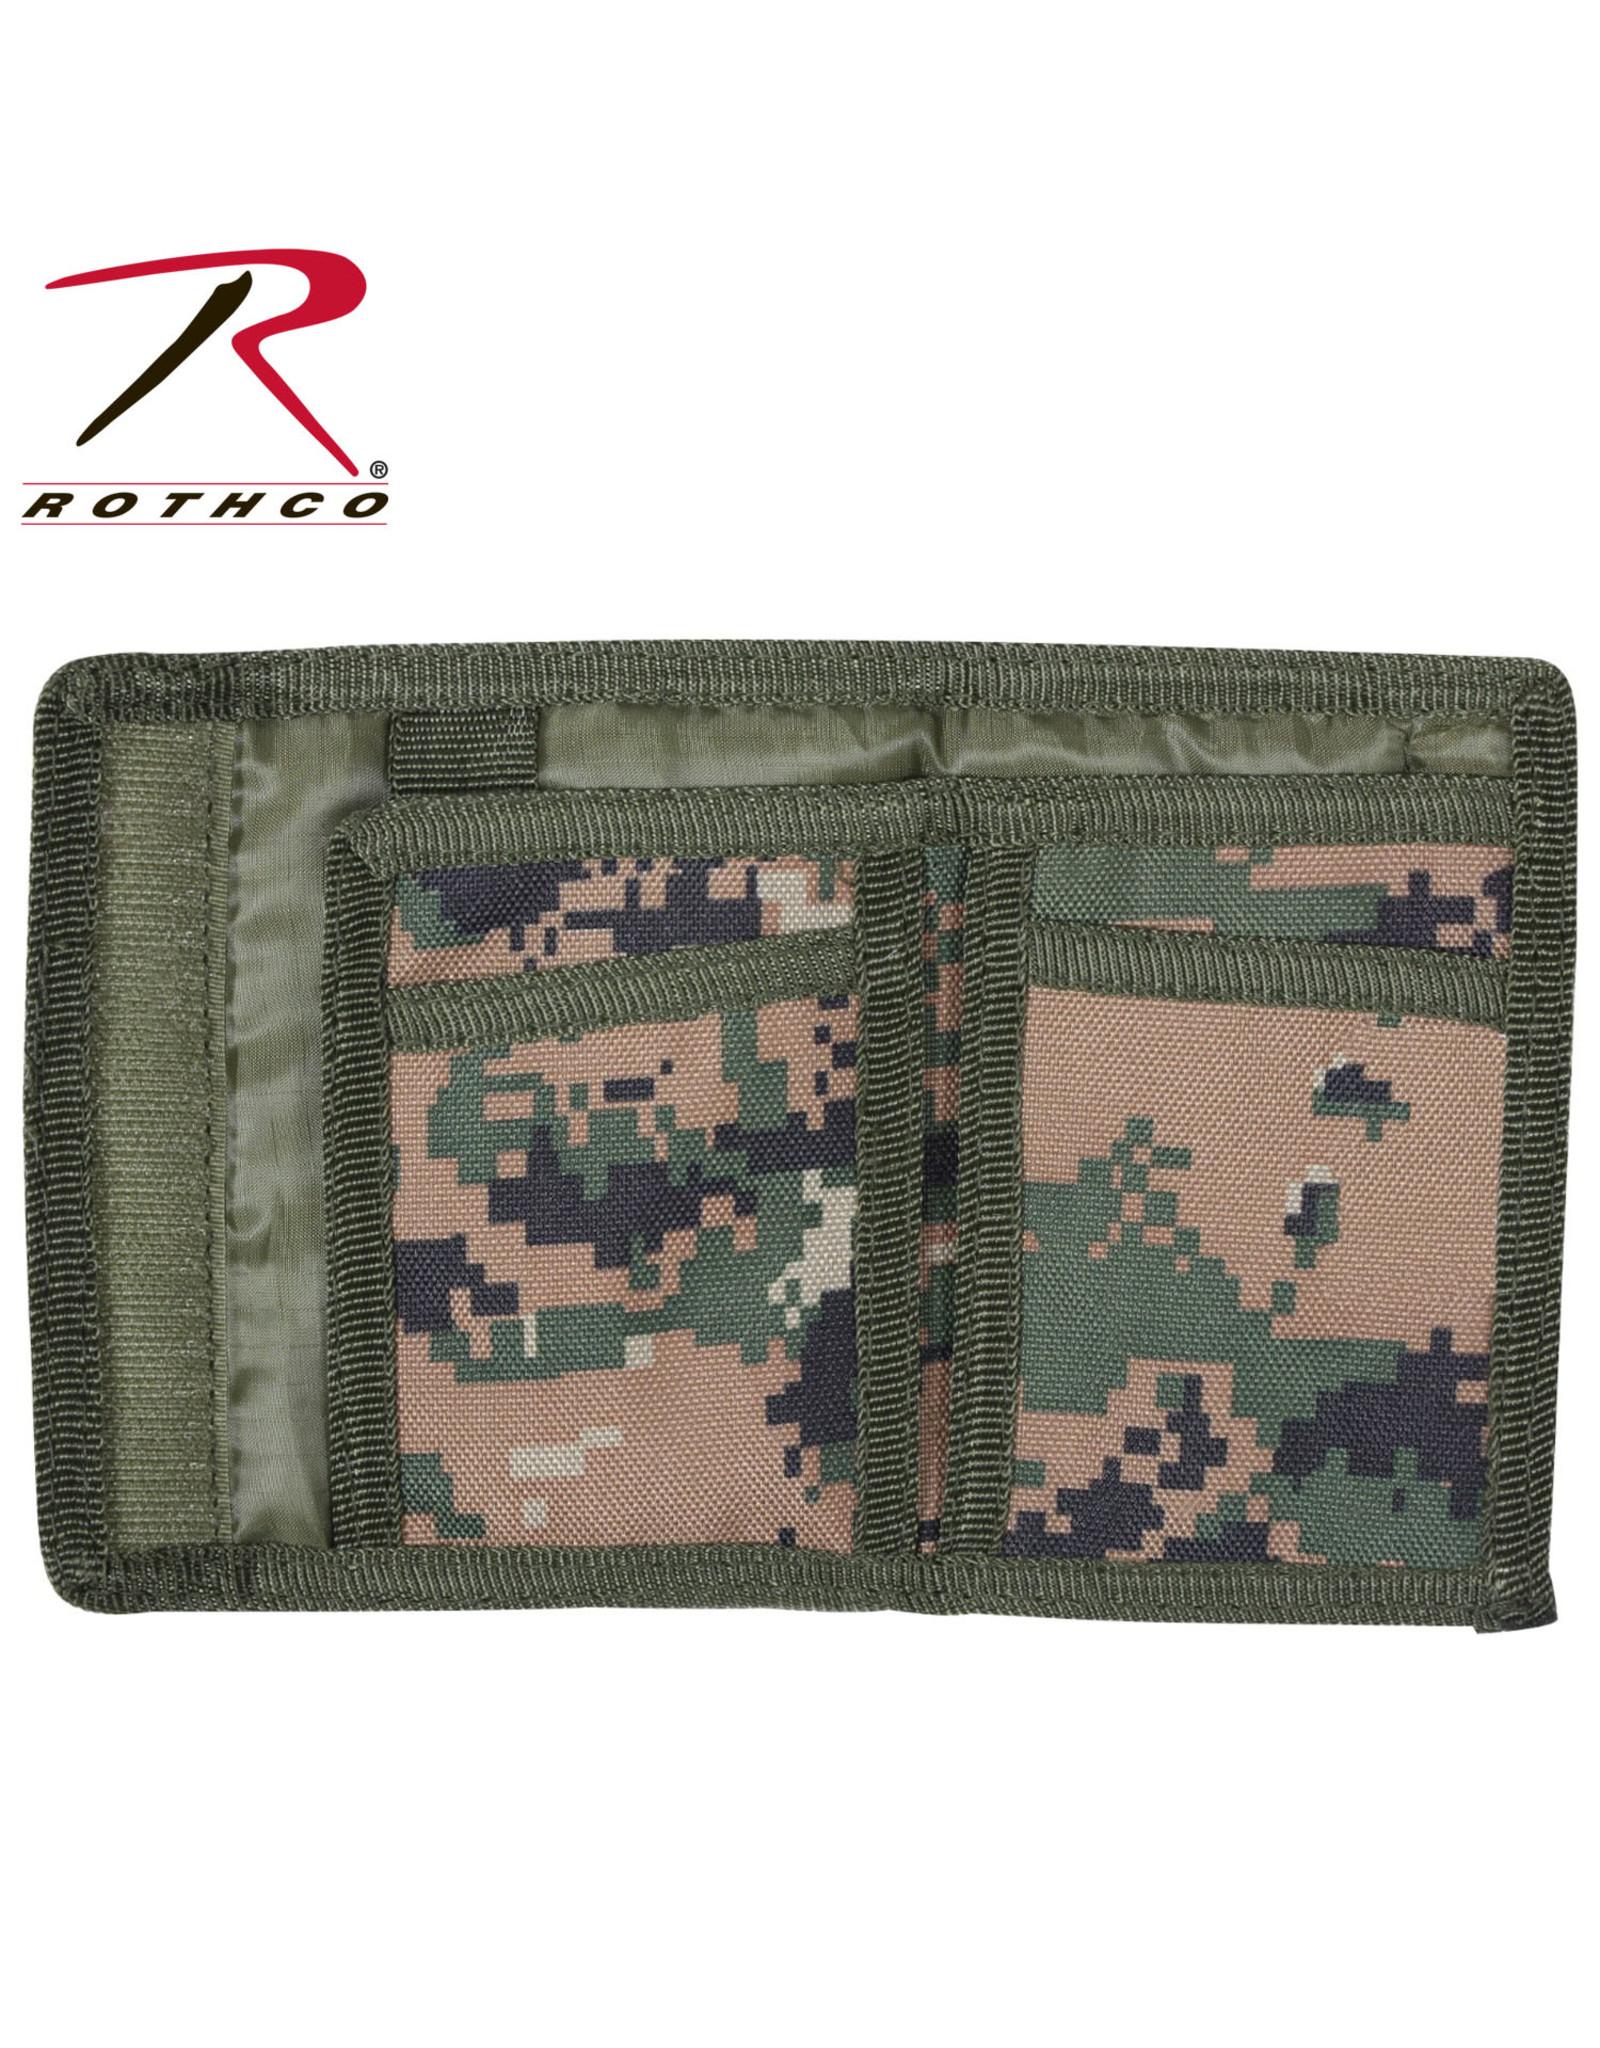 Rothco Rothco Commando Wallet